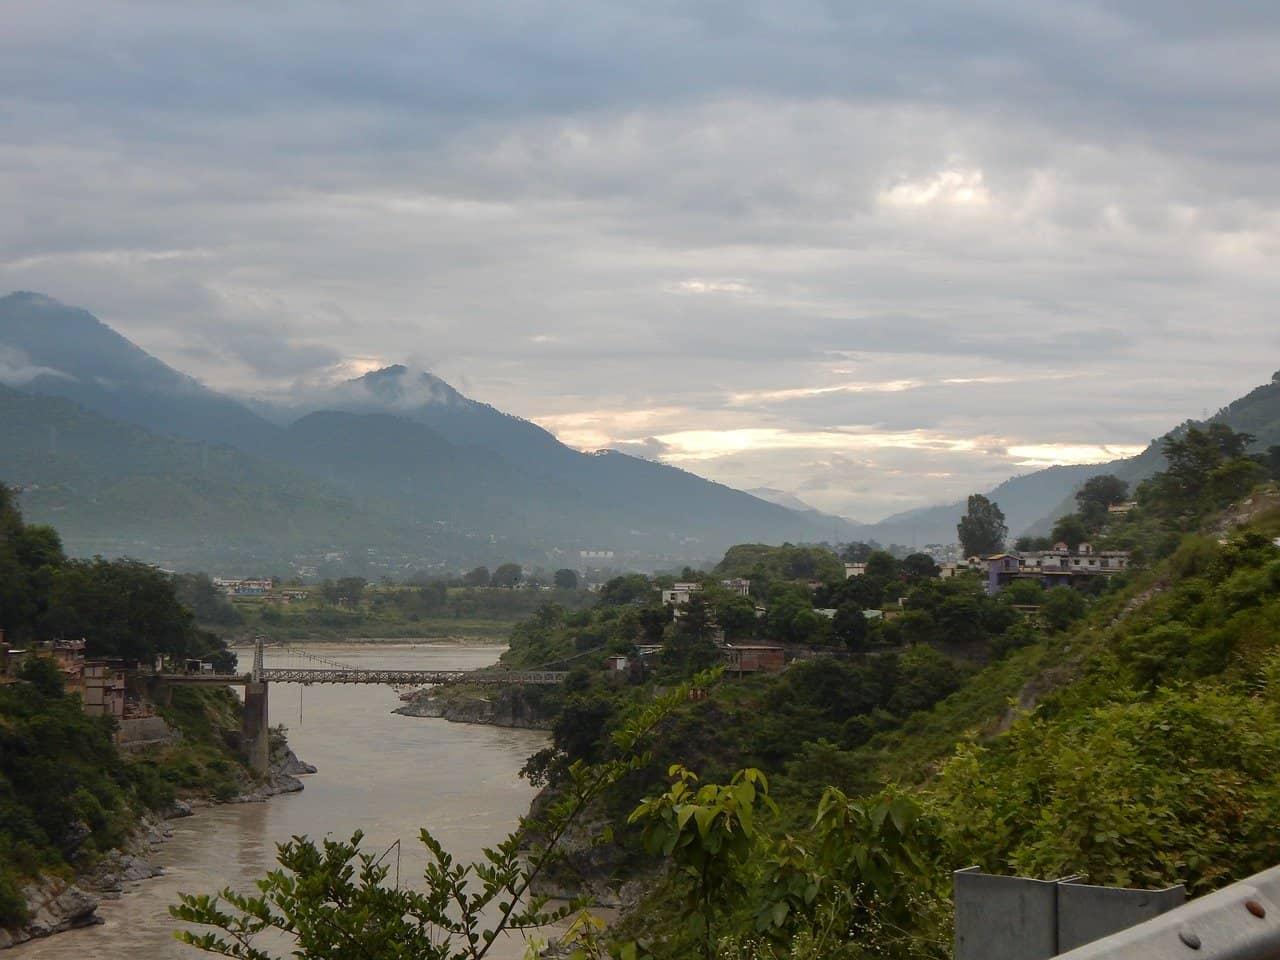 Walkig tour in Srinagar